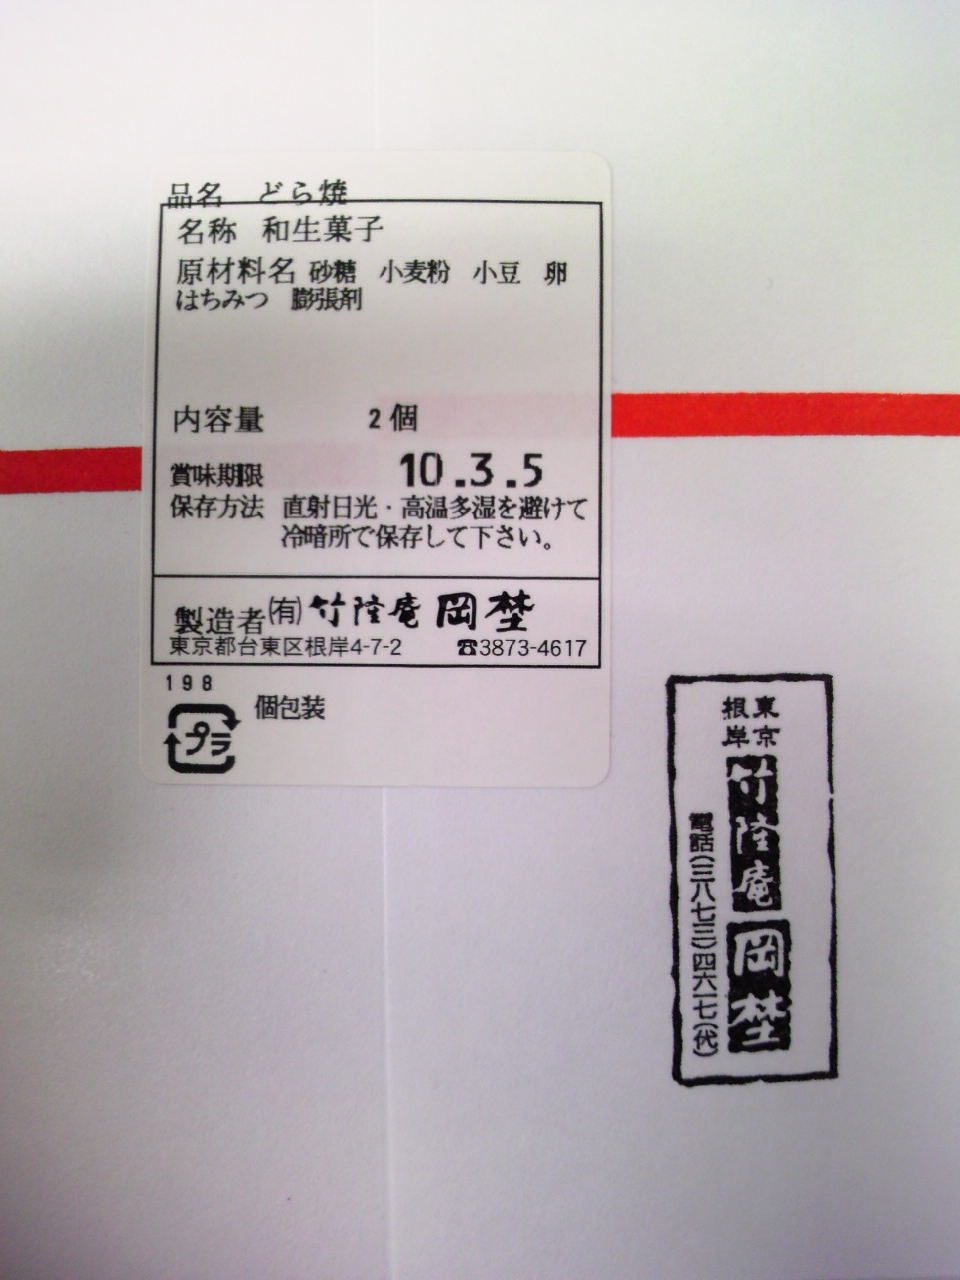 TS3O0134.jpg